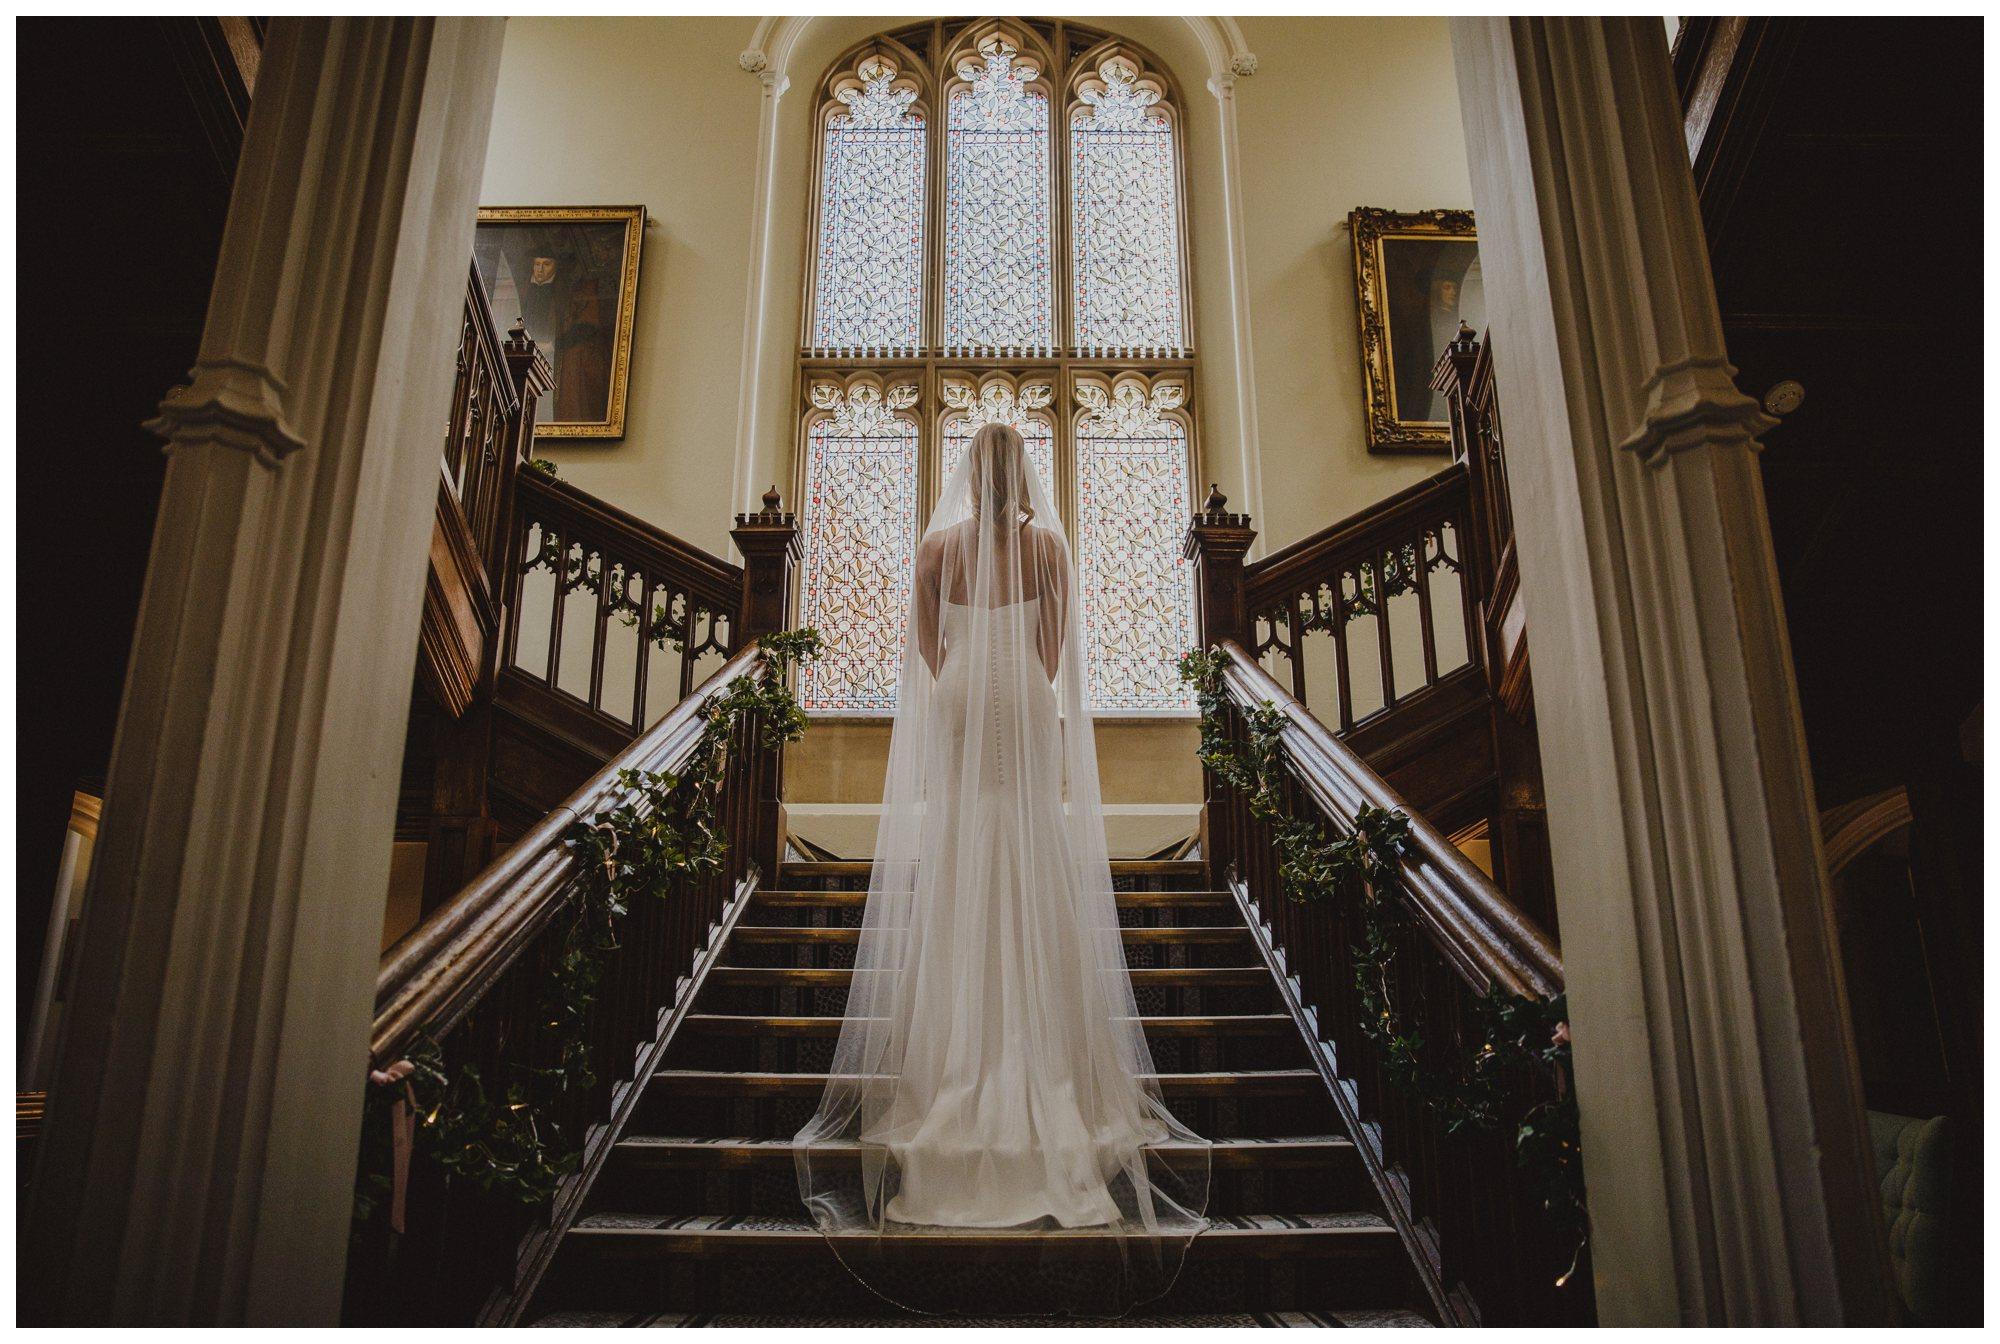 de-vere-latimer-estate-wedding-buckinghamshire_0048.jpg